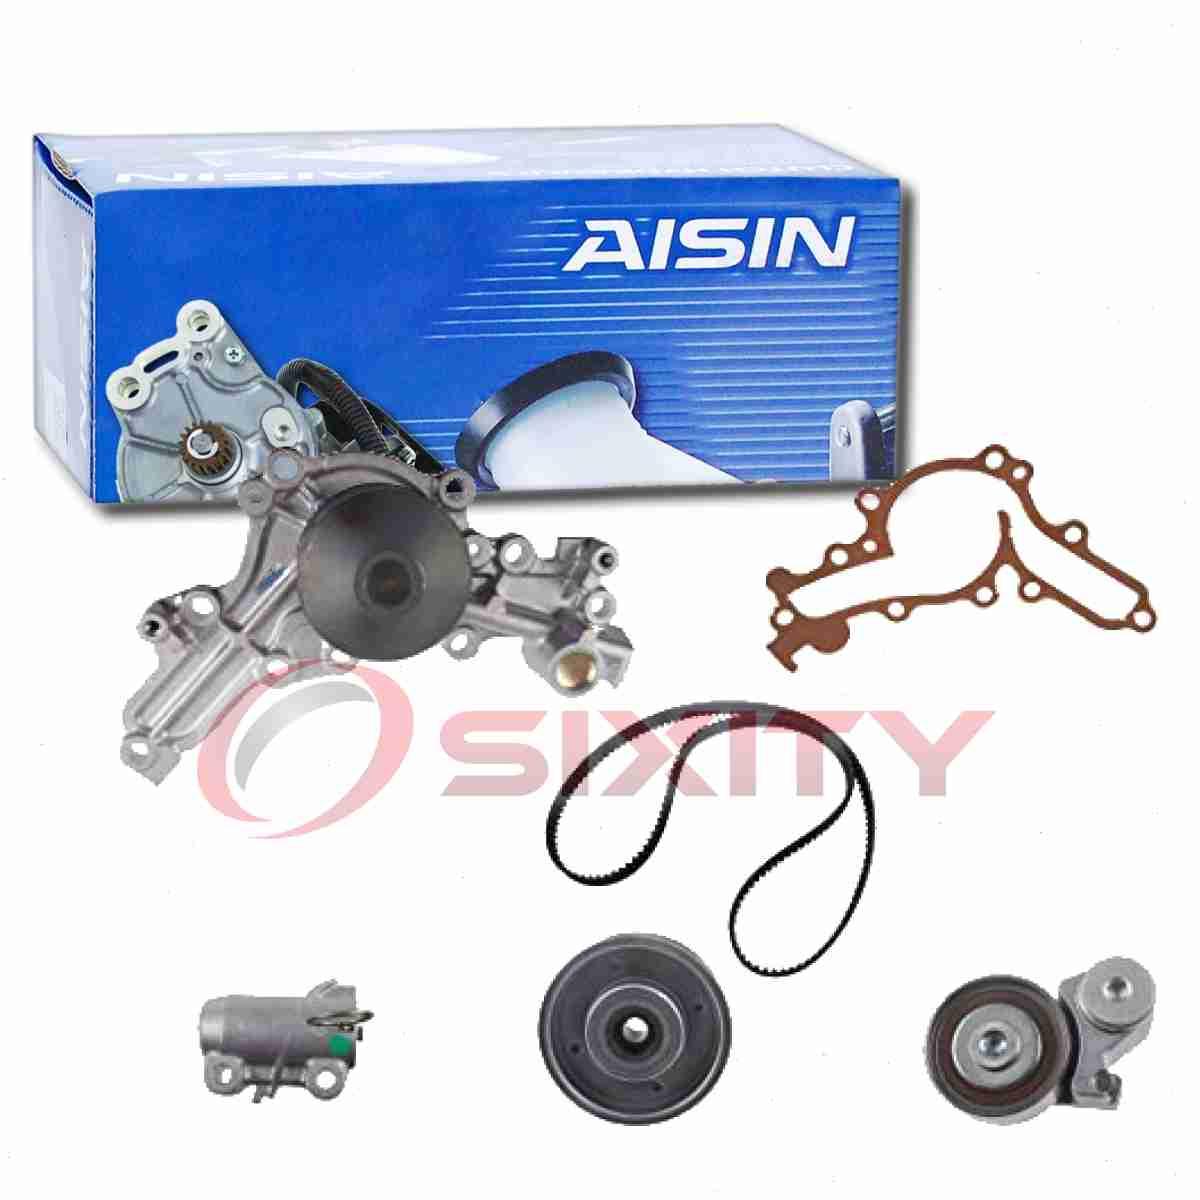 AISIN Engine Timing Cover for 2007-2020 Toyota Tundra 5.7L V8 Valve Train  xk